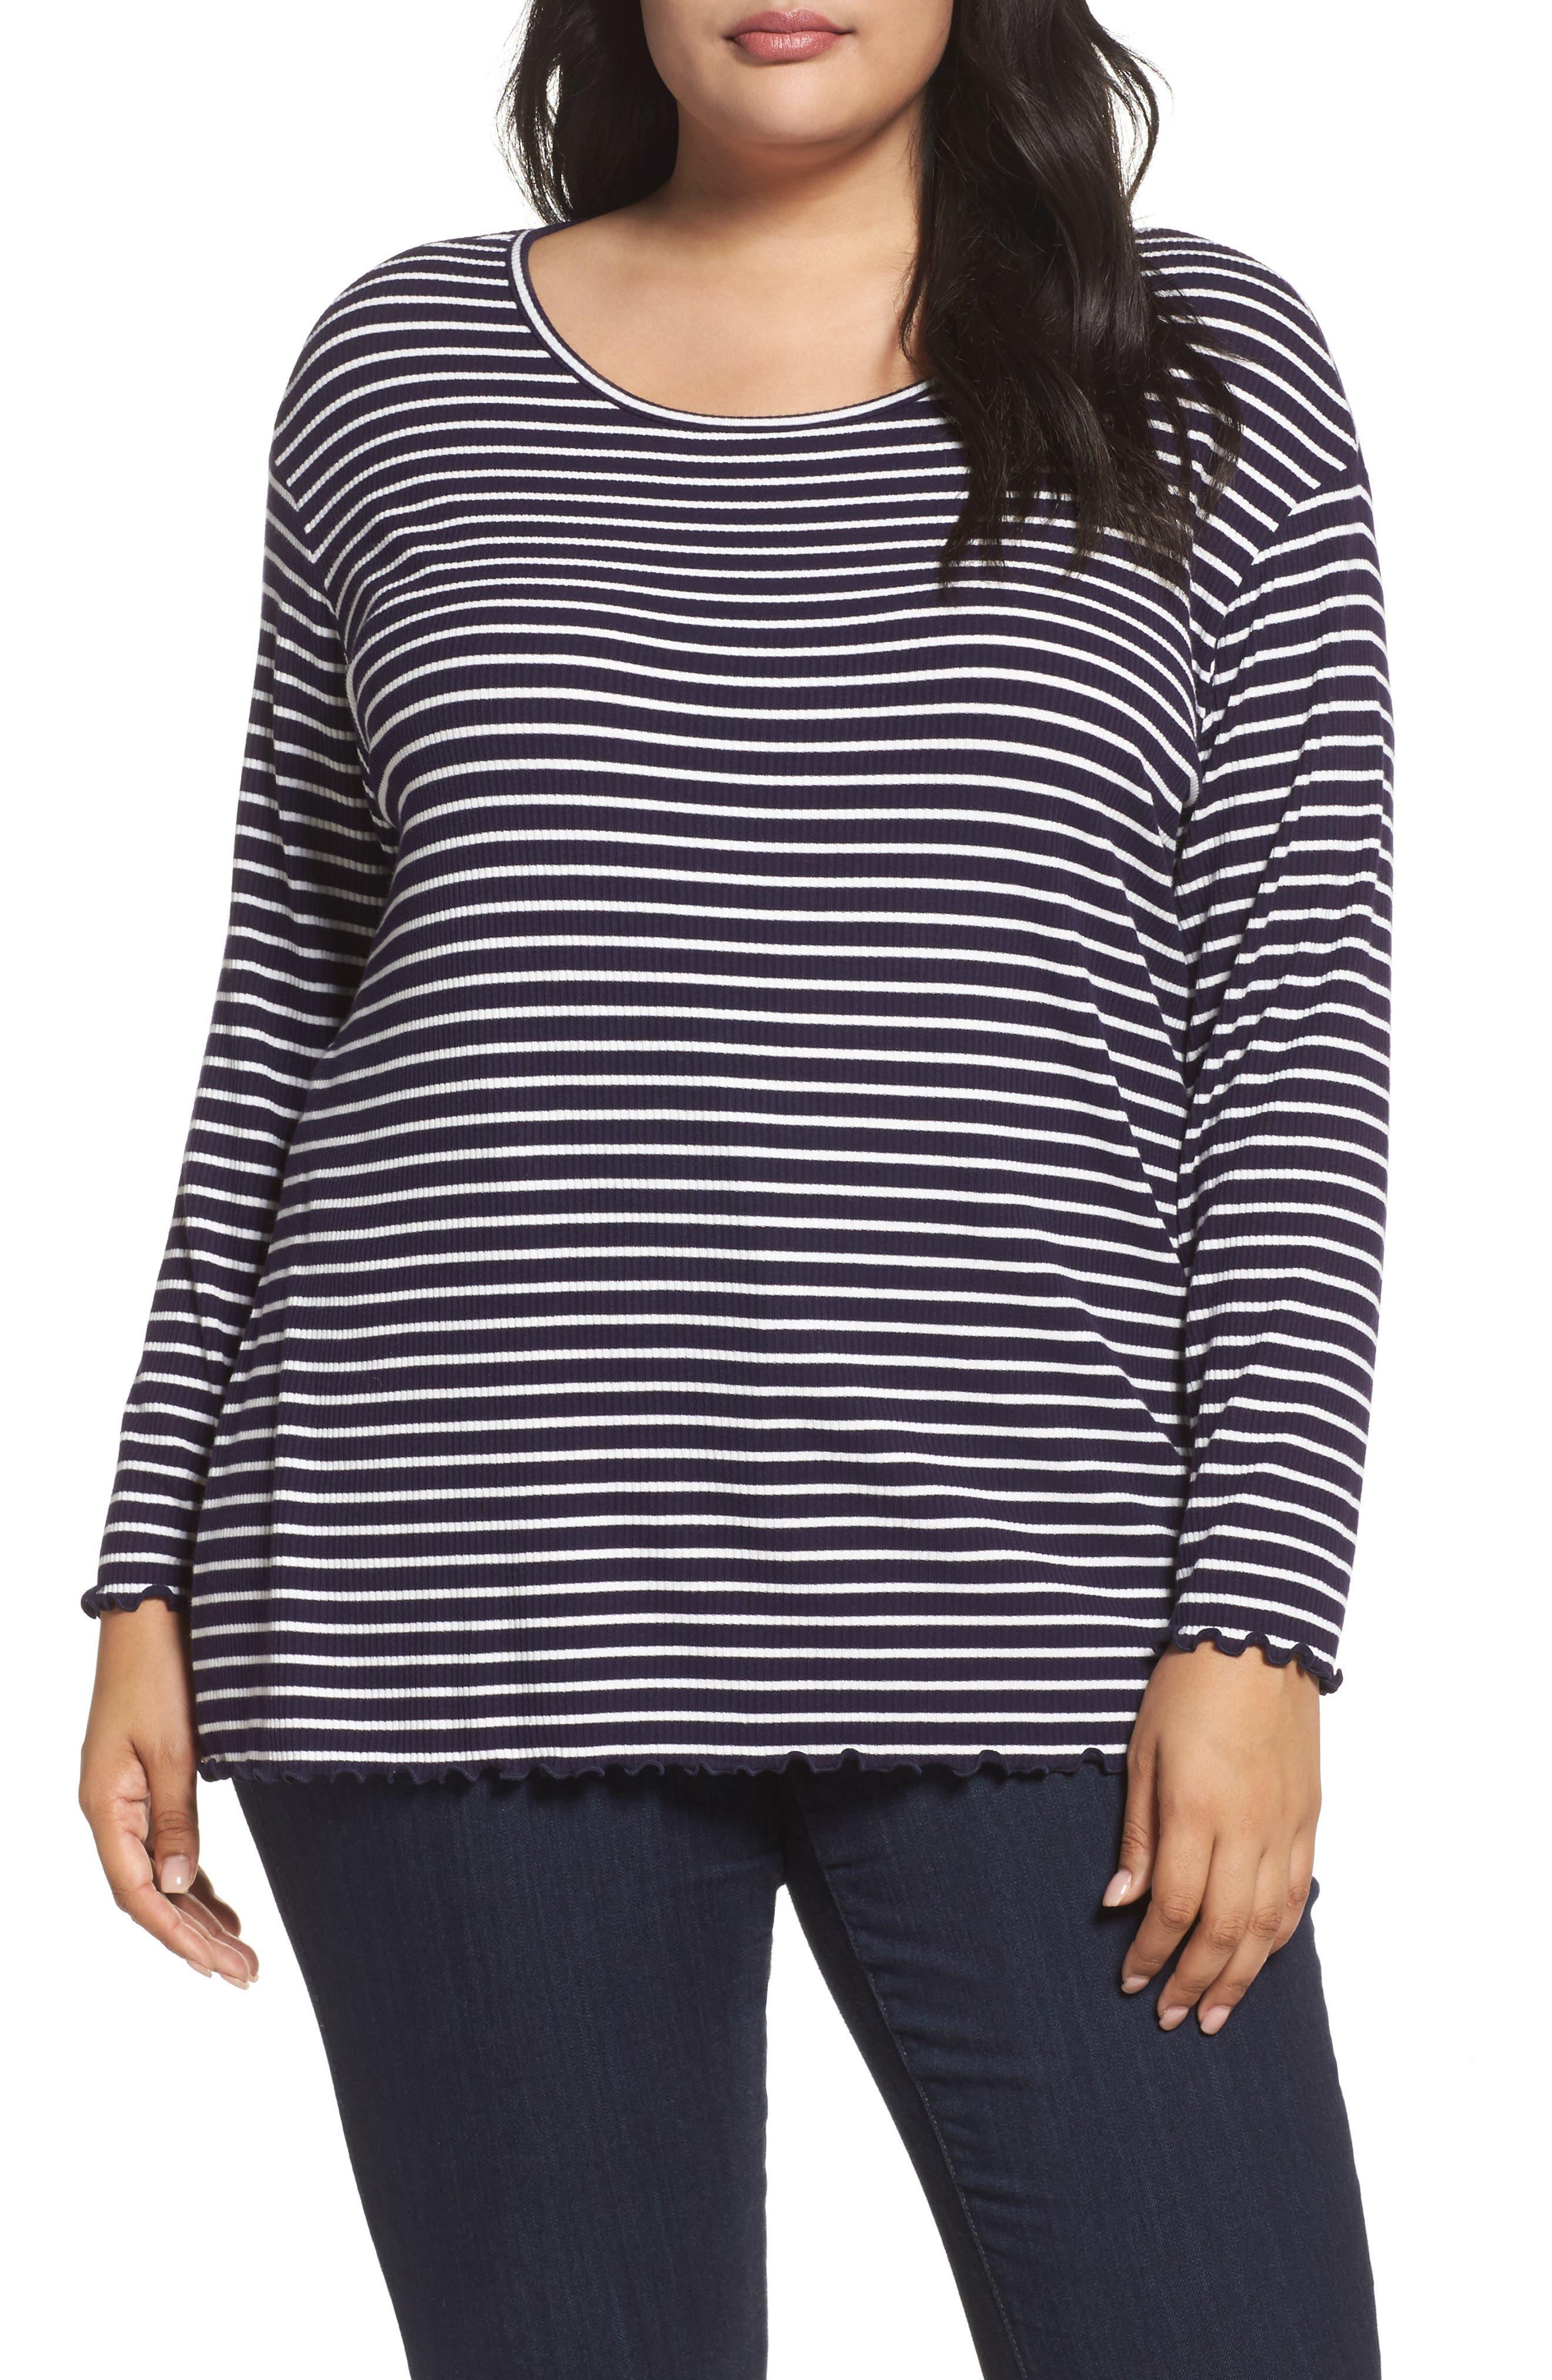 Scoop Neck Long Sleeve Tee,                             Main thumbnail 1, color,                             Navy- White Stripe